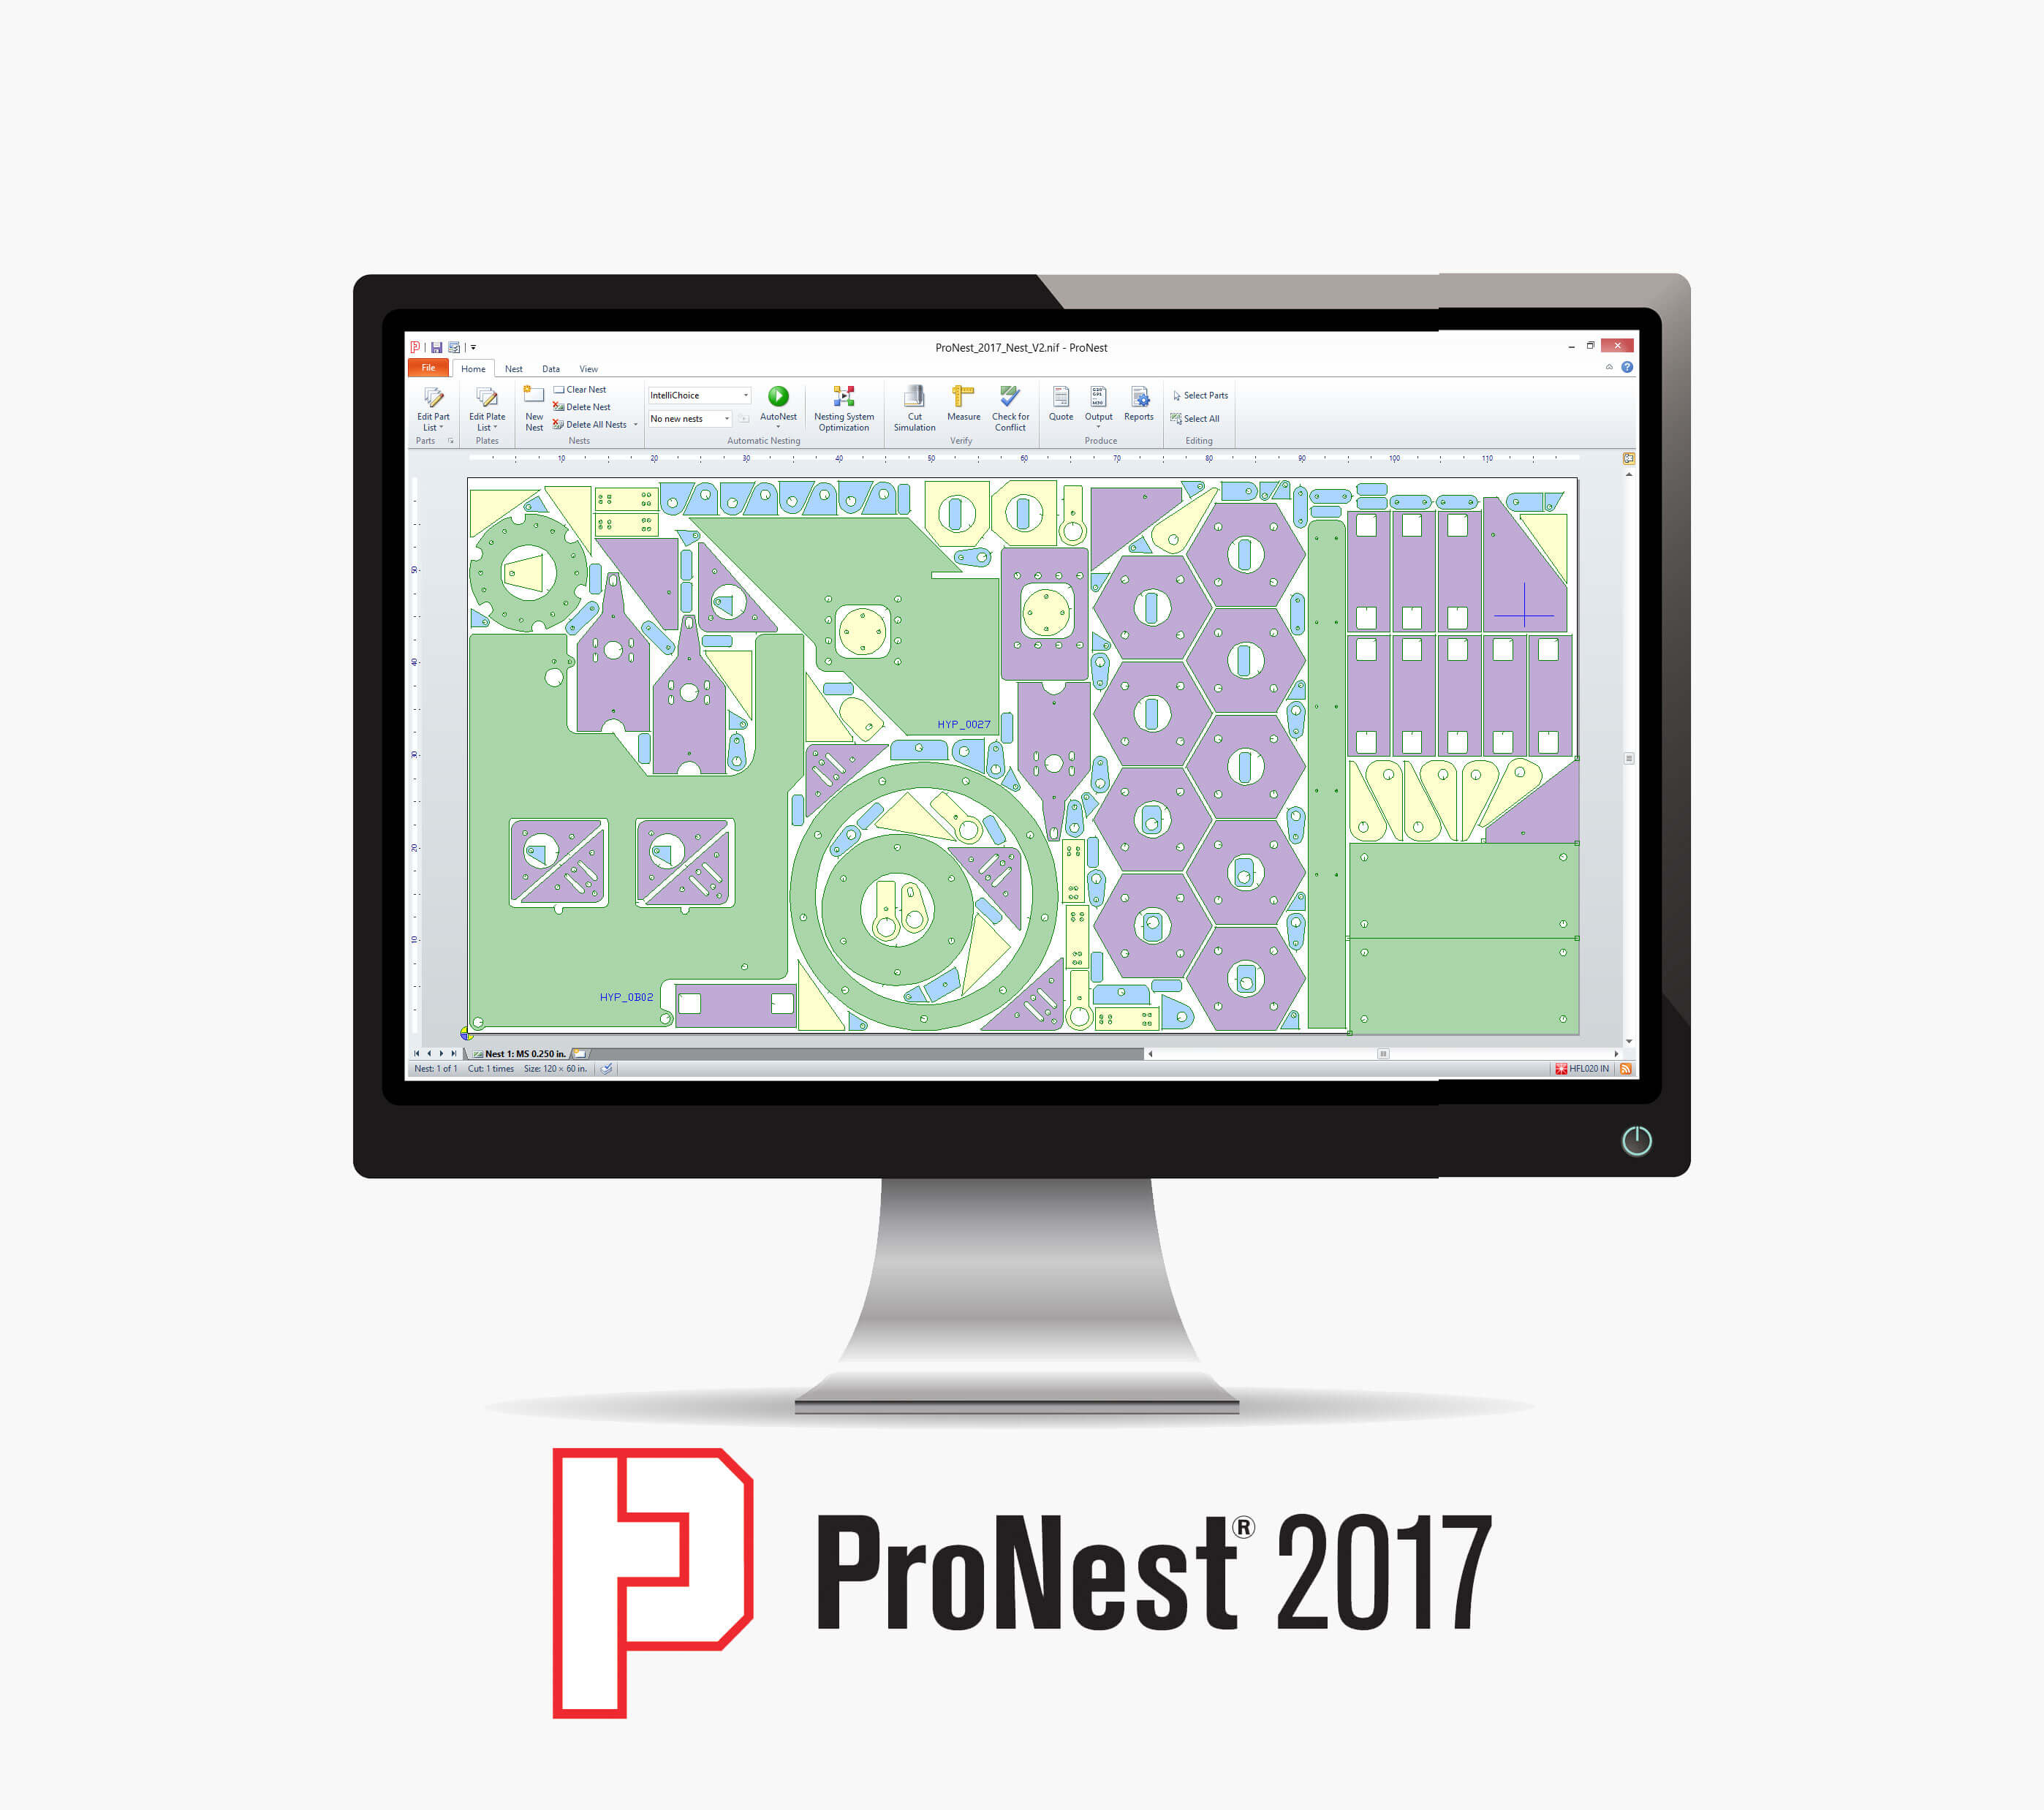 pronest-2017